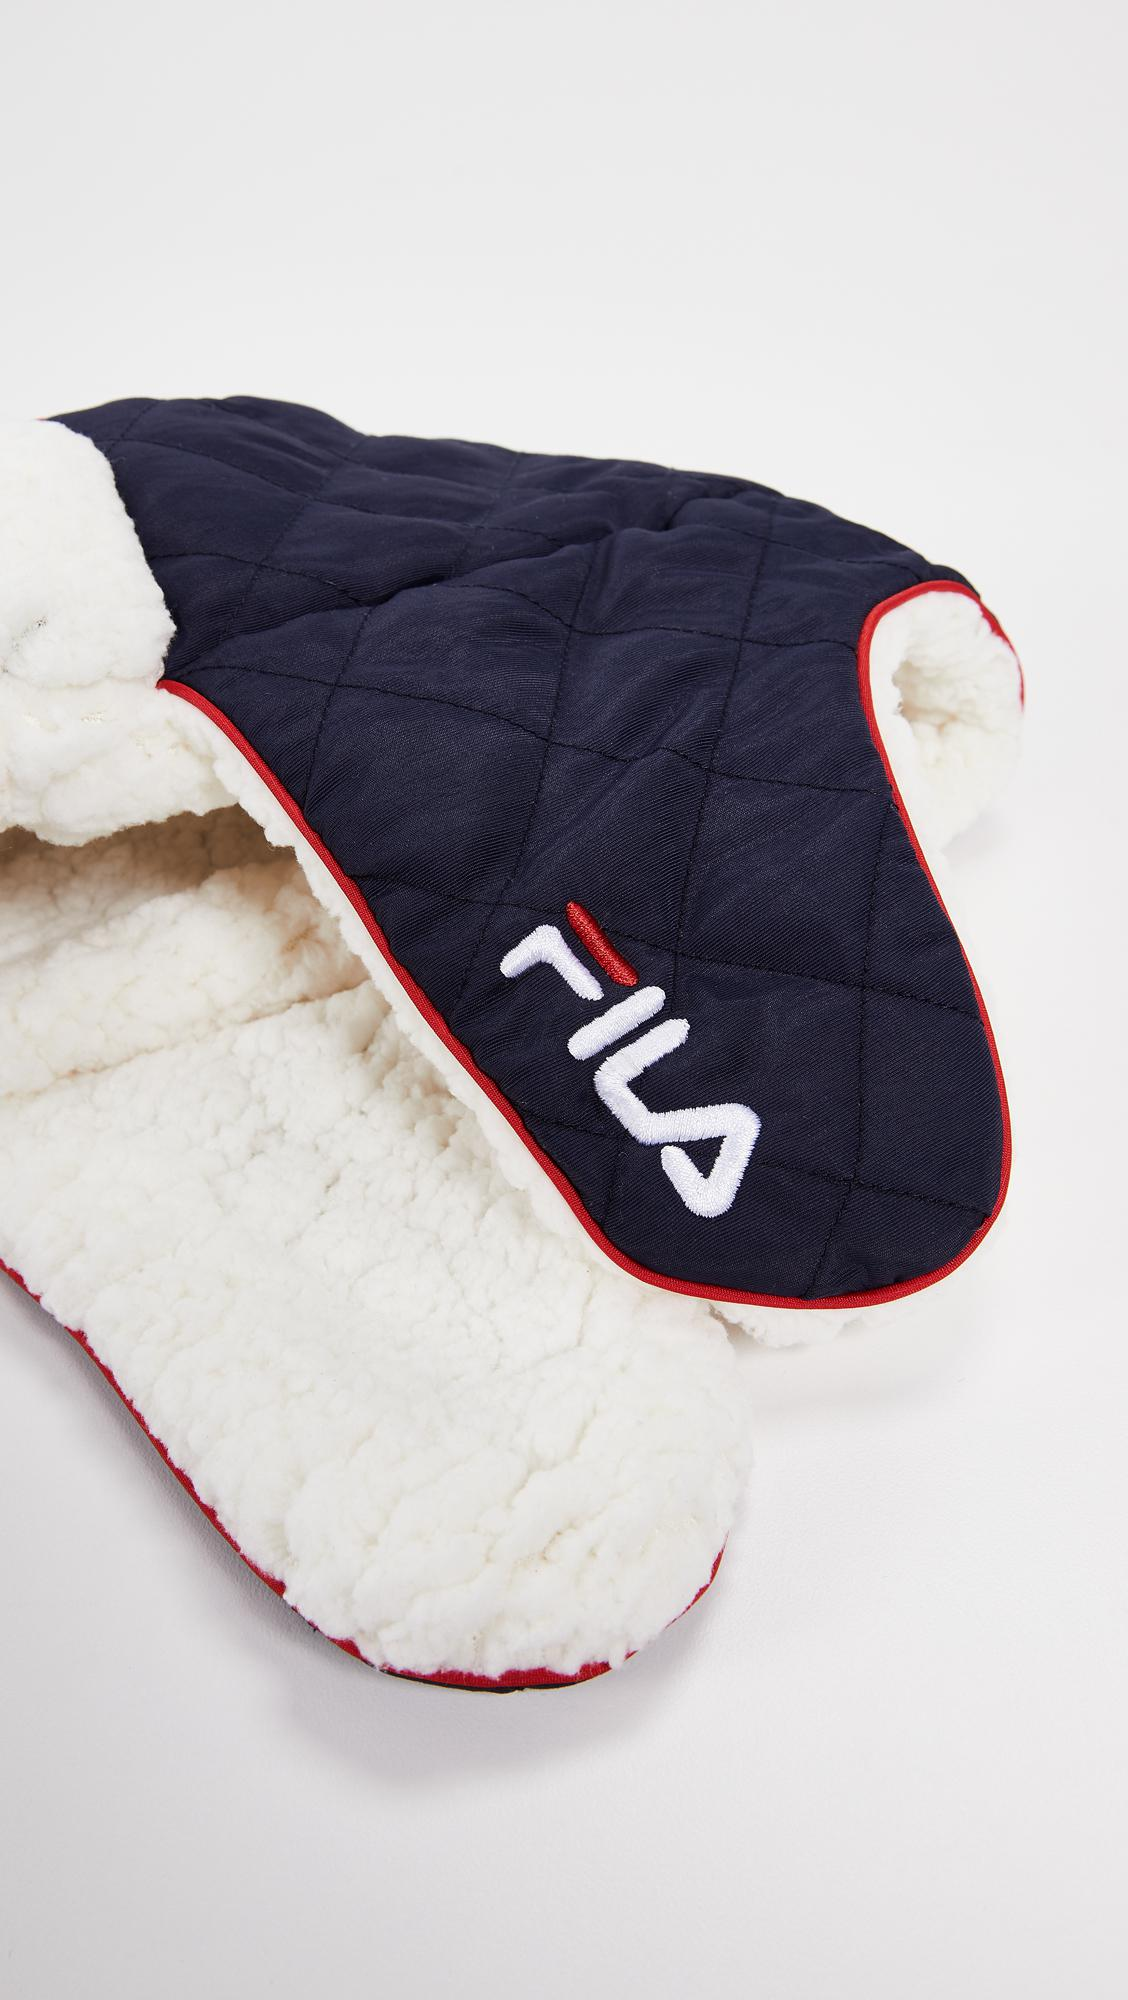 6b07b94635c8e Fila Trapper Hat in Blue for Men - Lyst